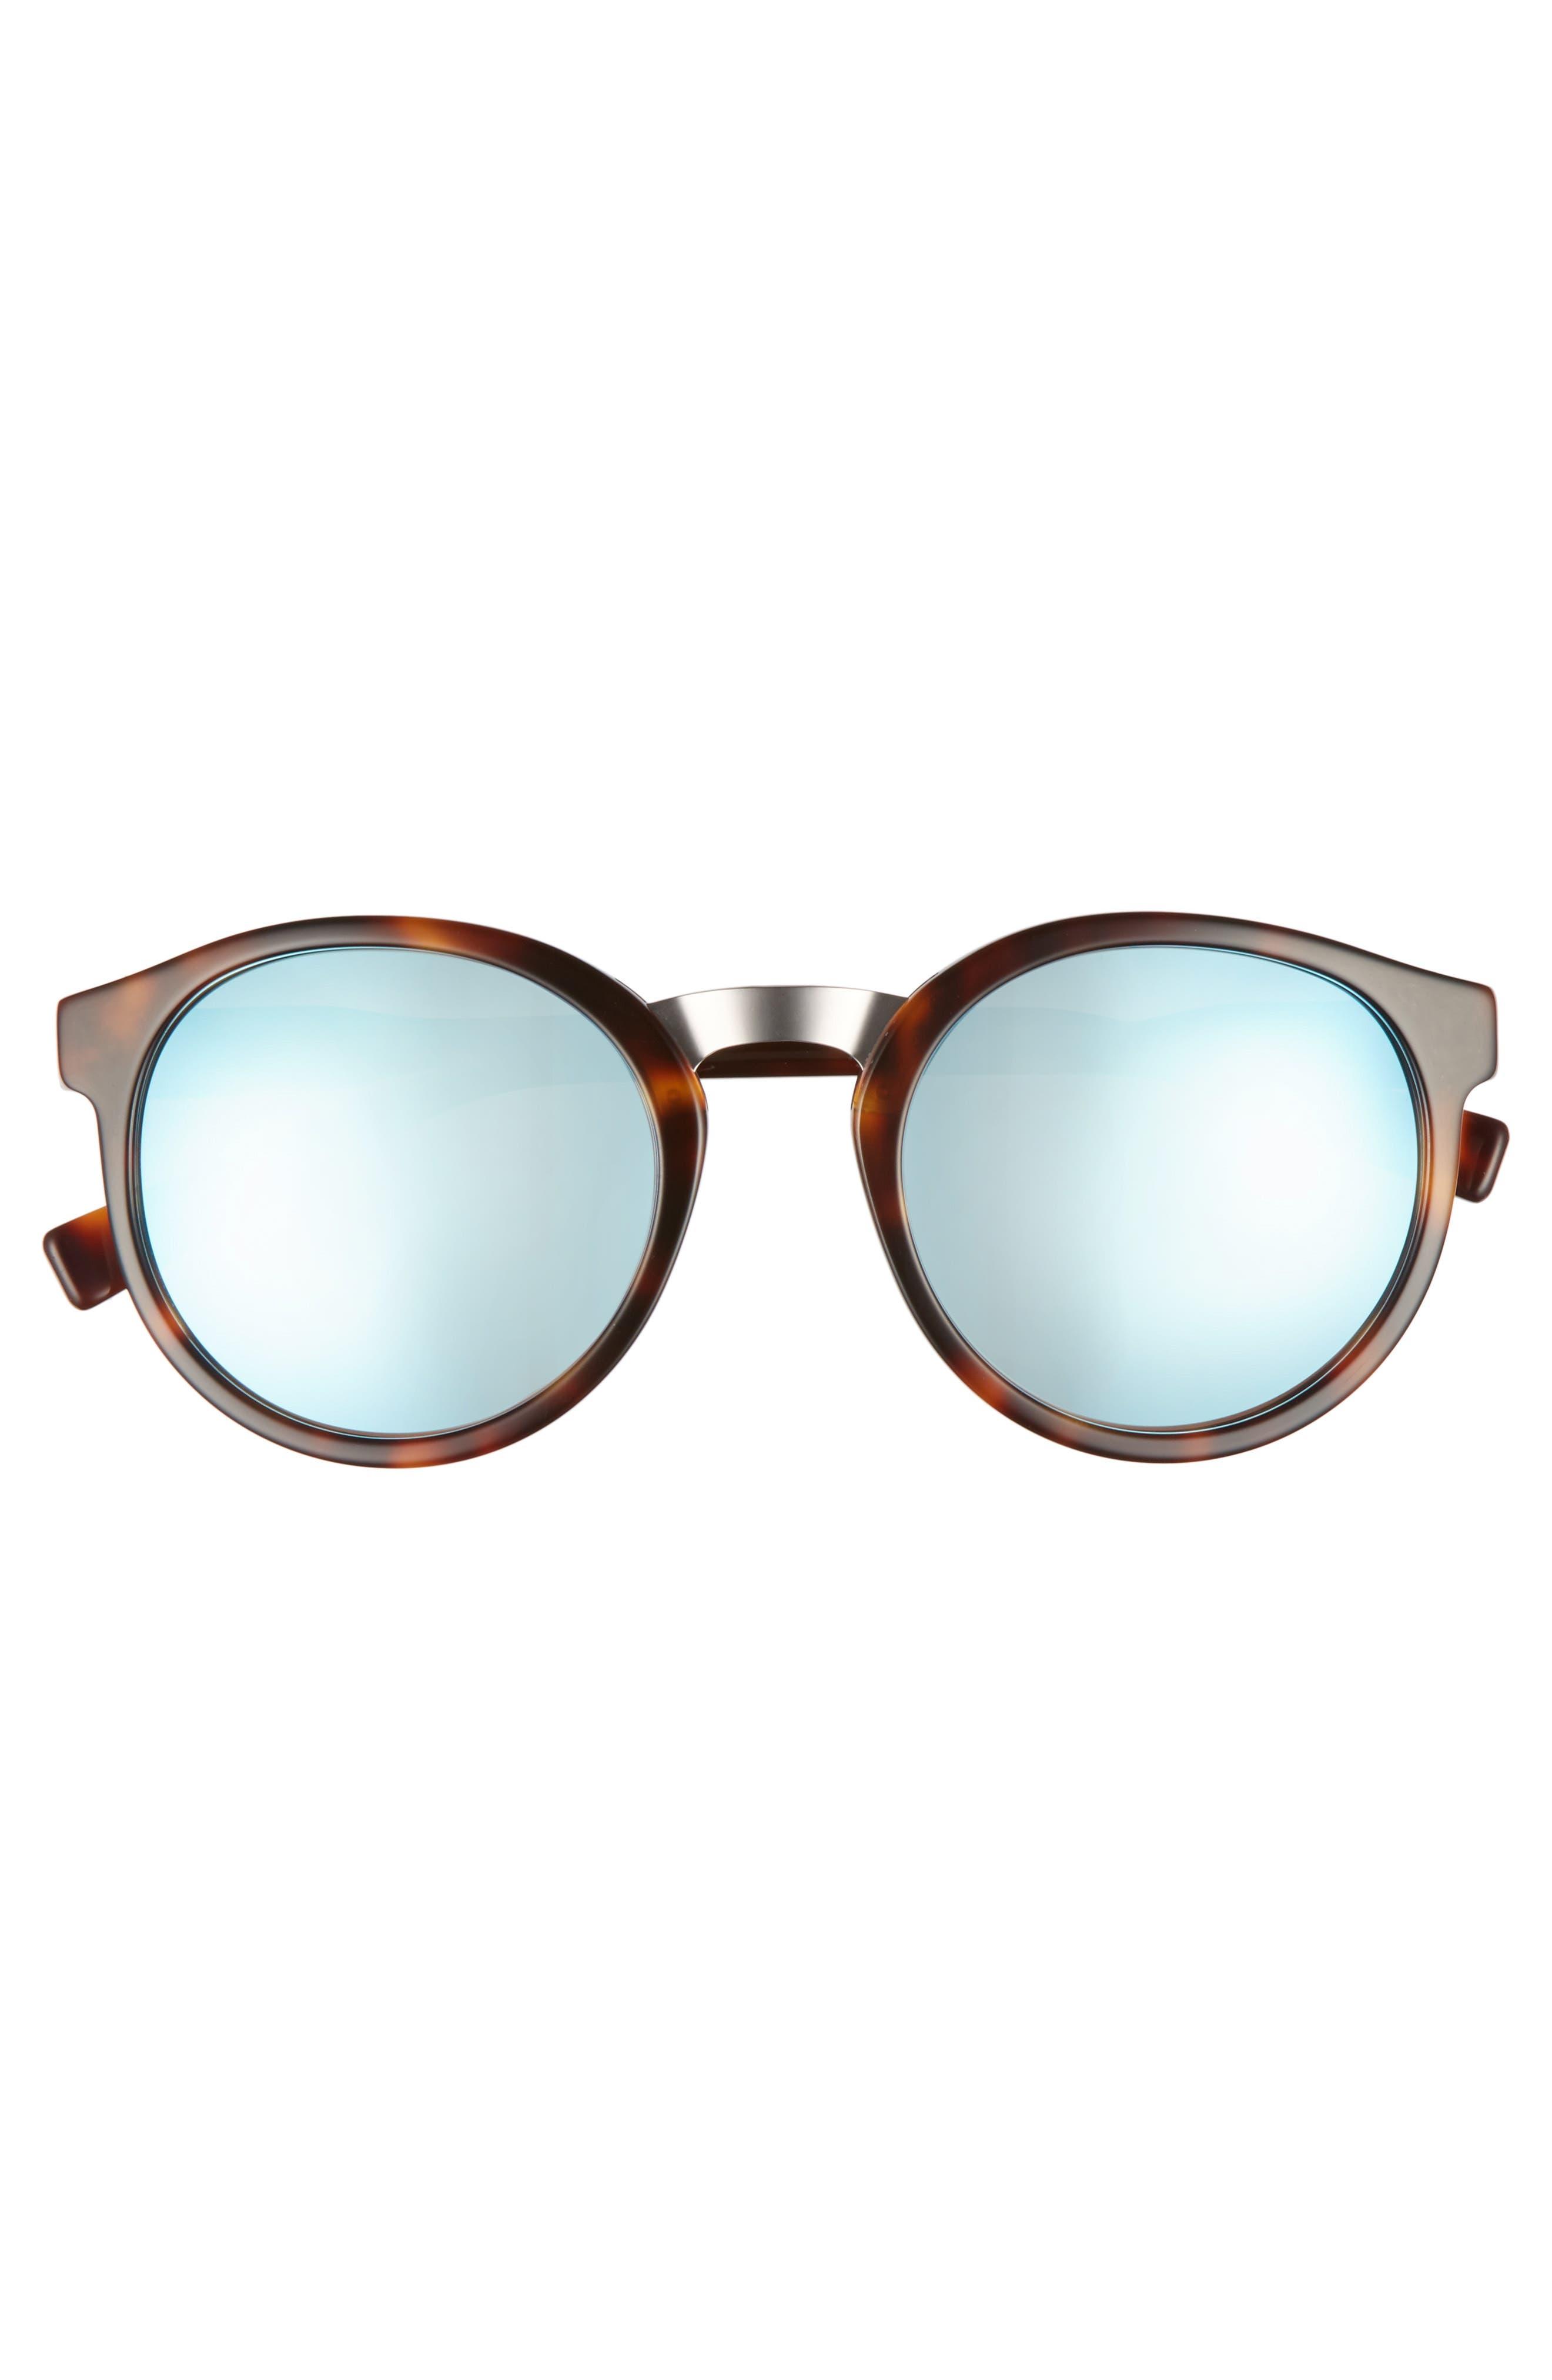 53mm Round Sunglasses,                             Alternate thumbnail 10, color,